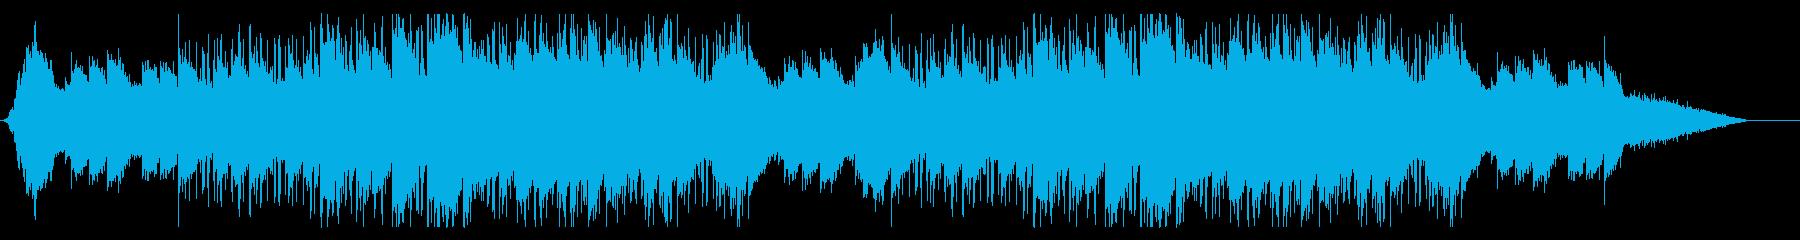 VP しっとりと暗いヒップホップの再生済みの波形